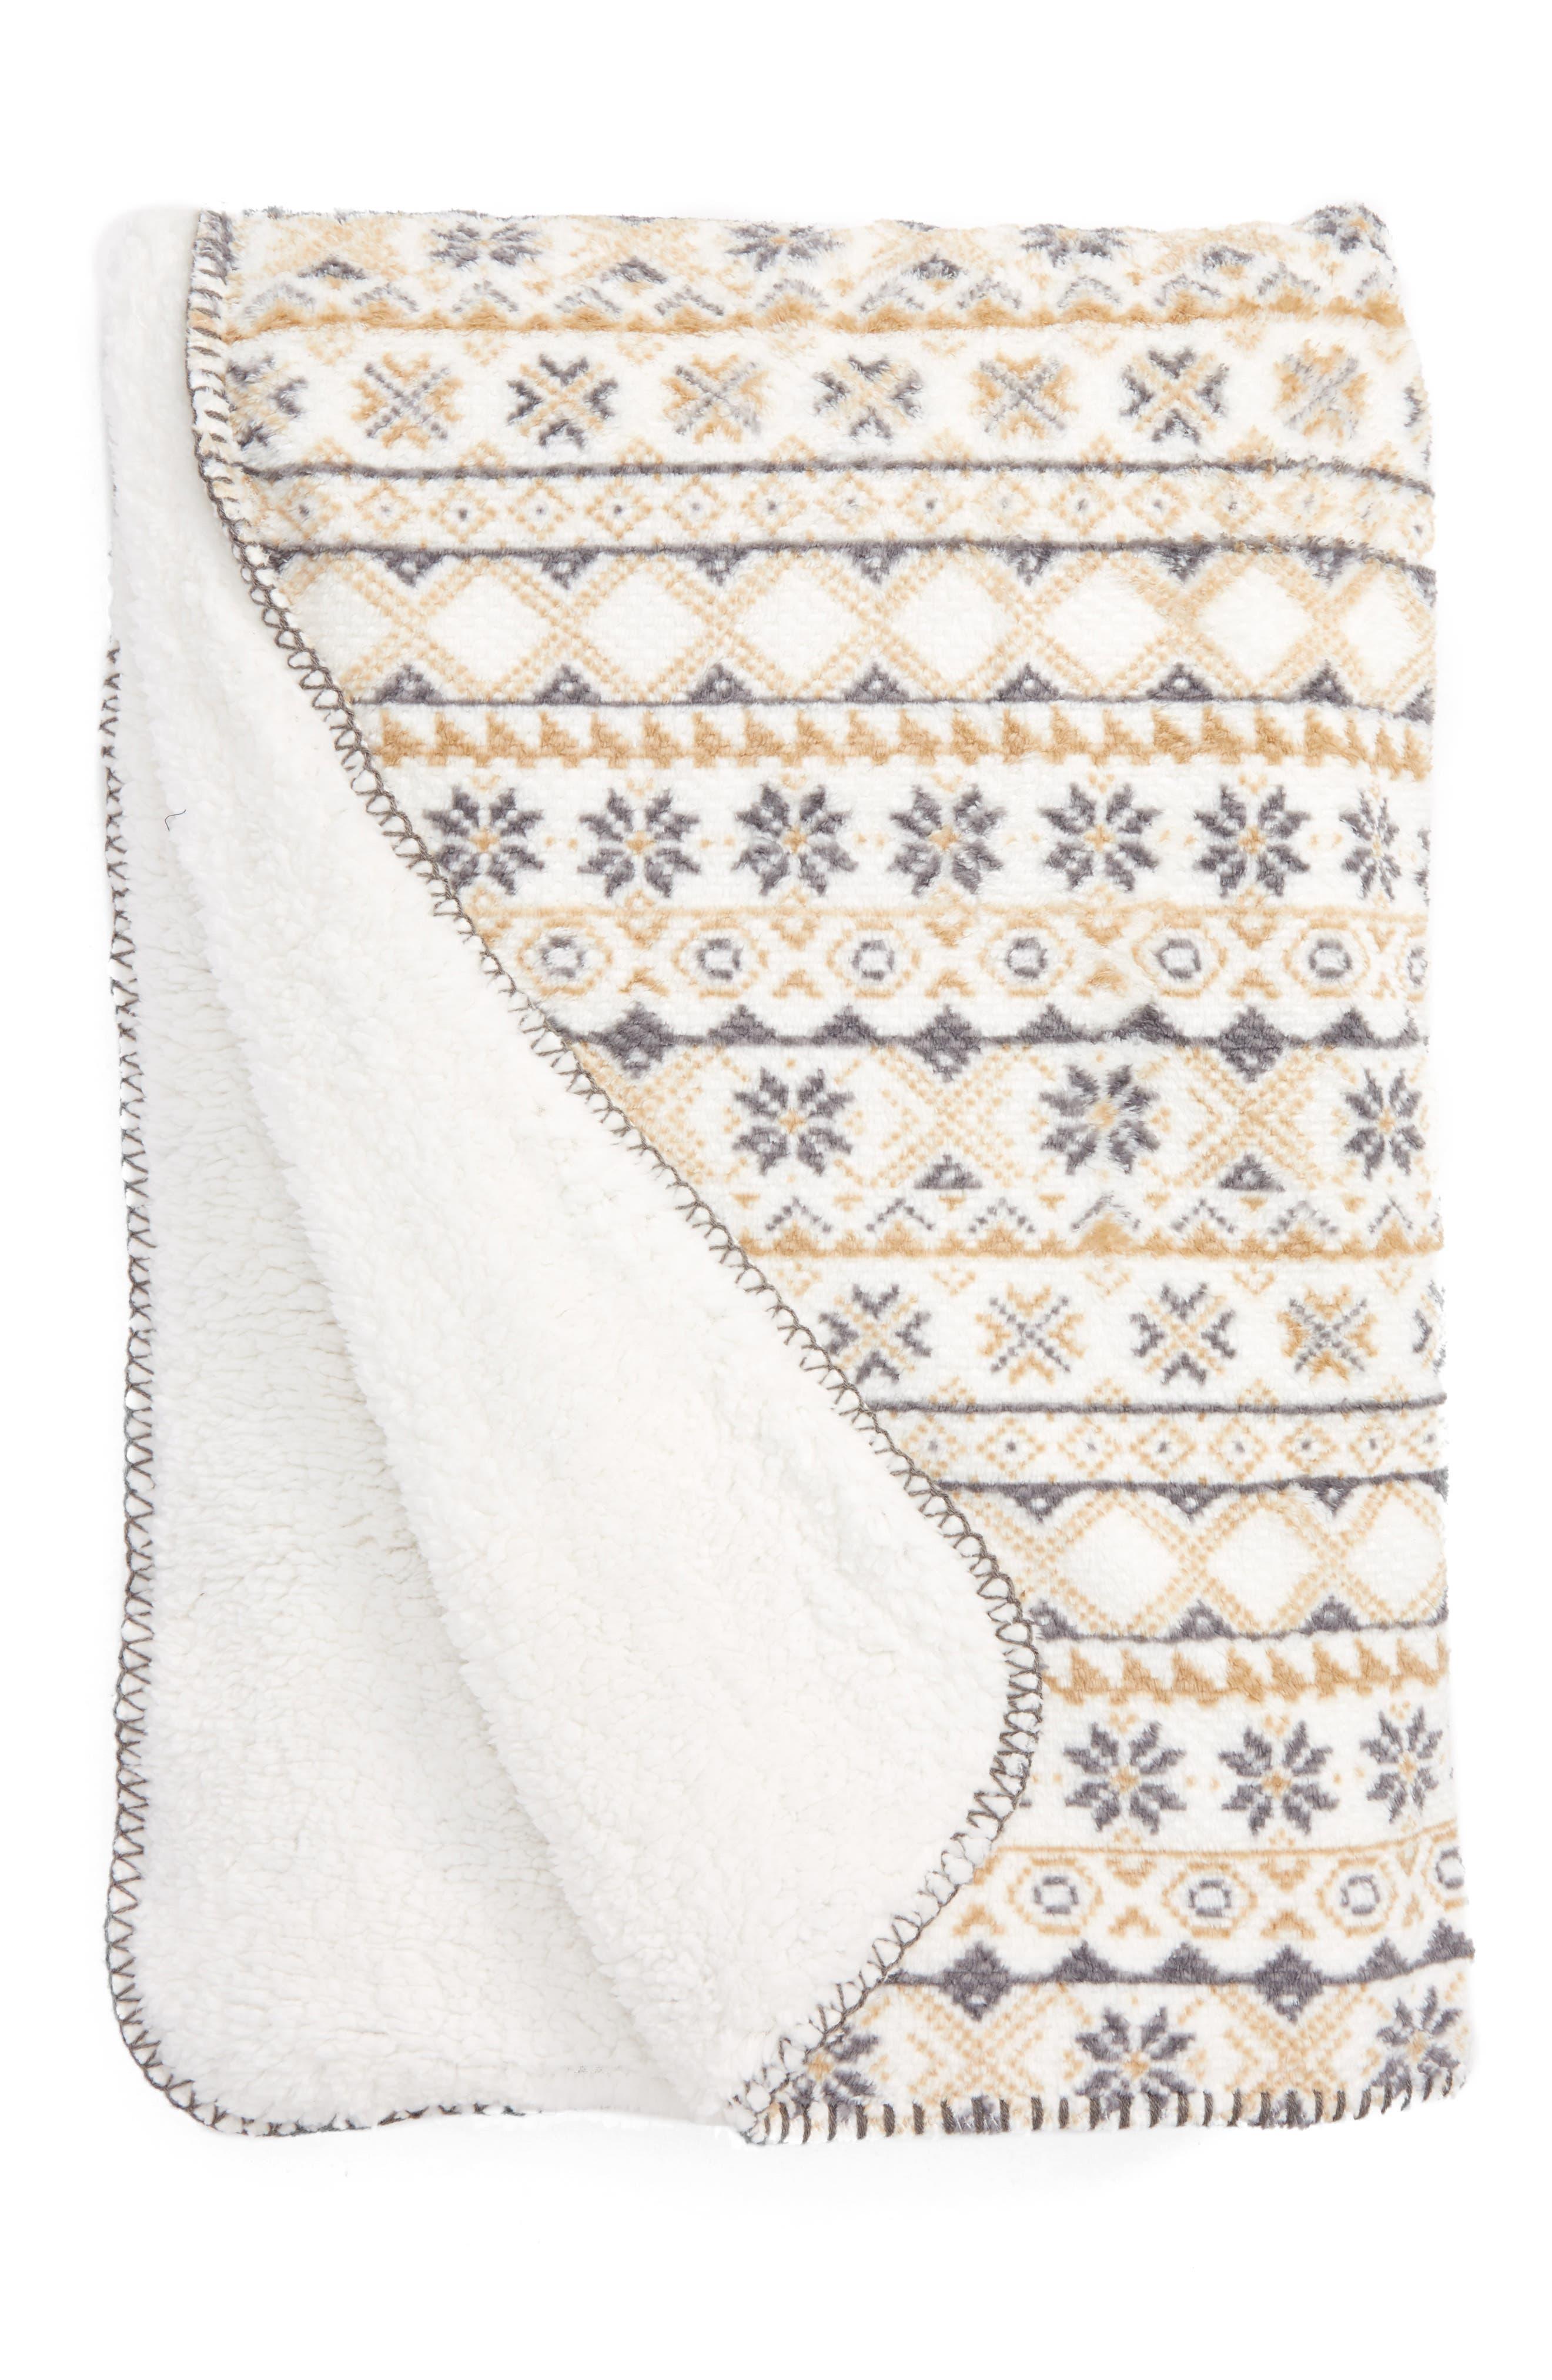 Fair Isle Print Faux Shearling Blanket,                         Main,                         color, 900